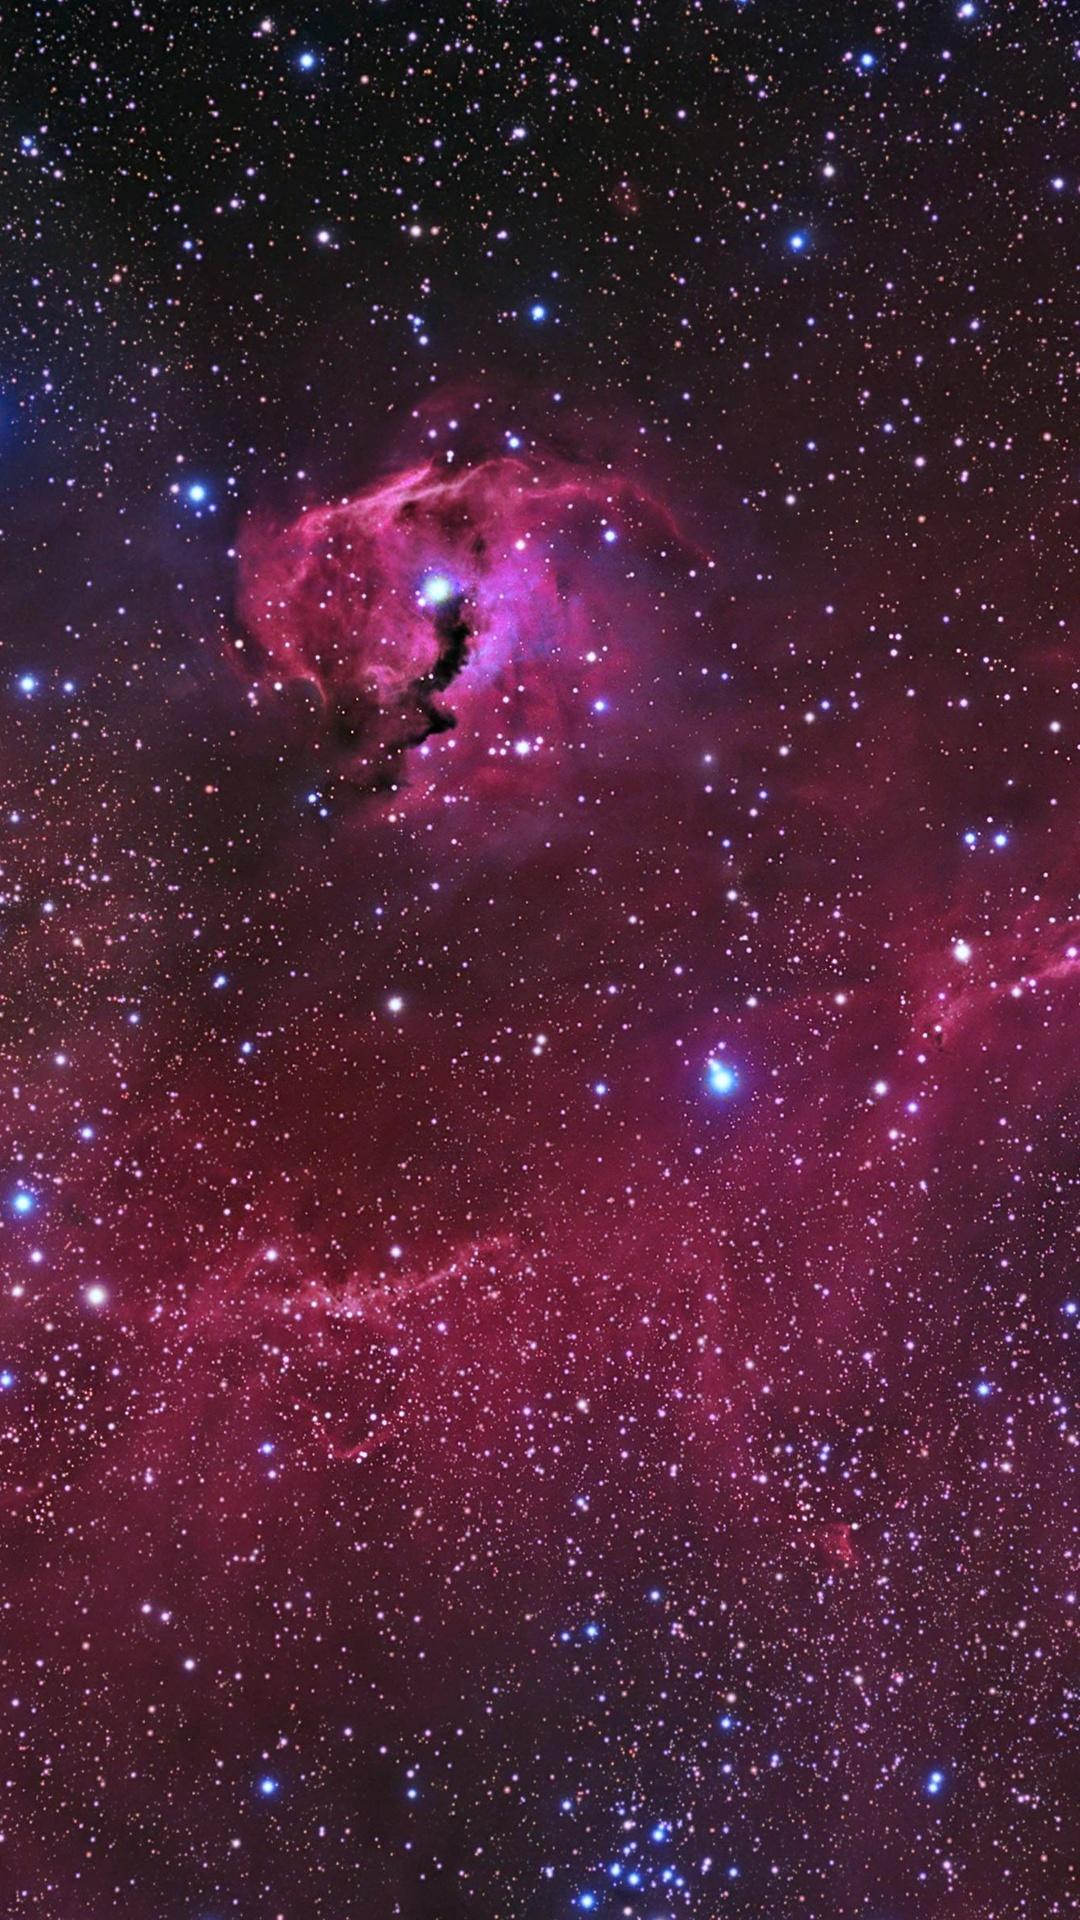 1080x1920 Galaxy Nebula Planets Space Stars Iphone 7,6s,6 ...